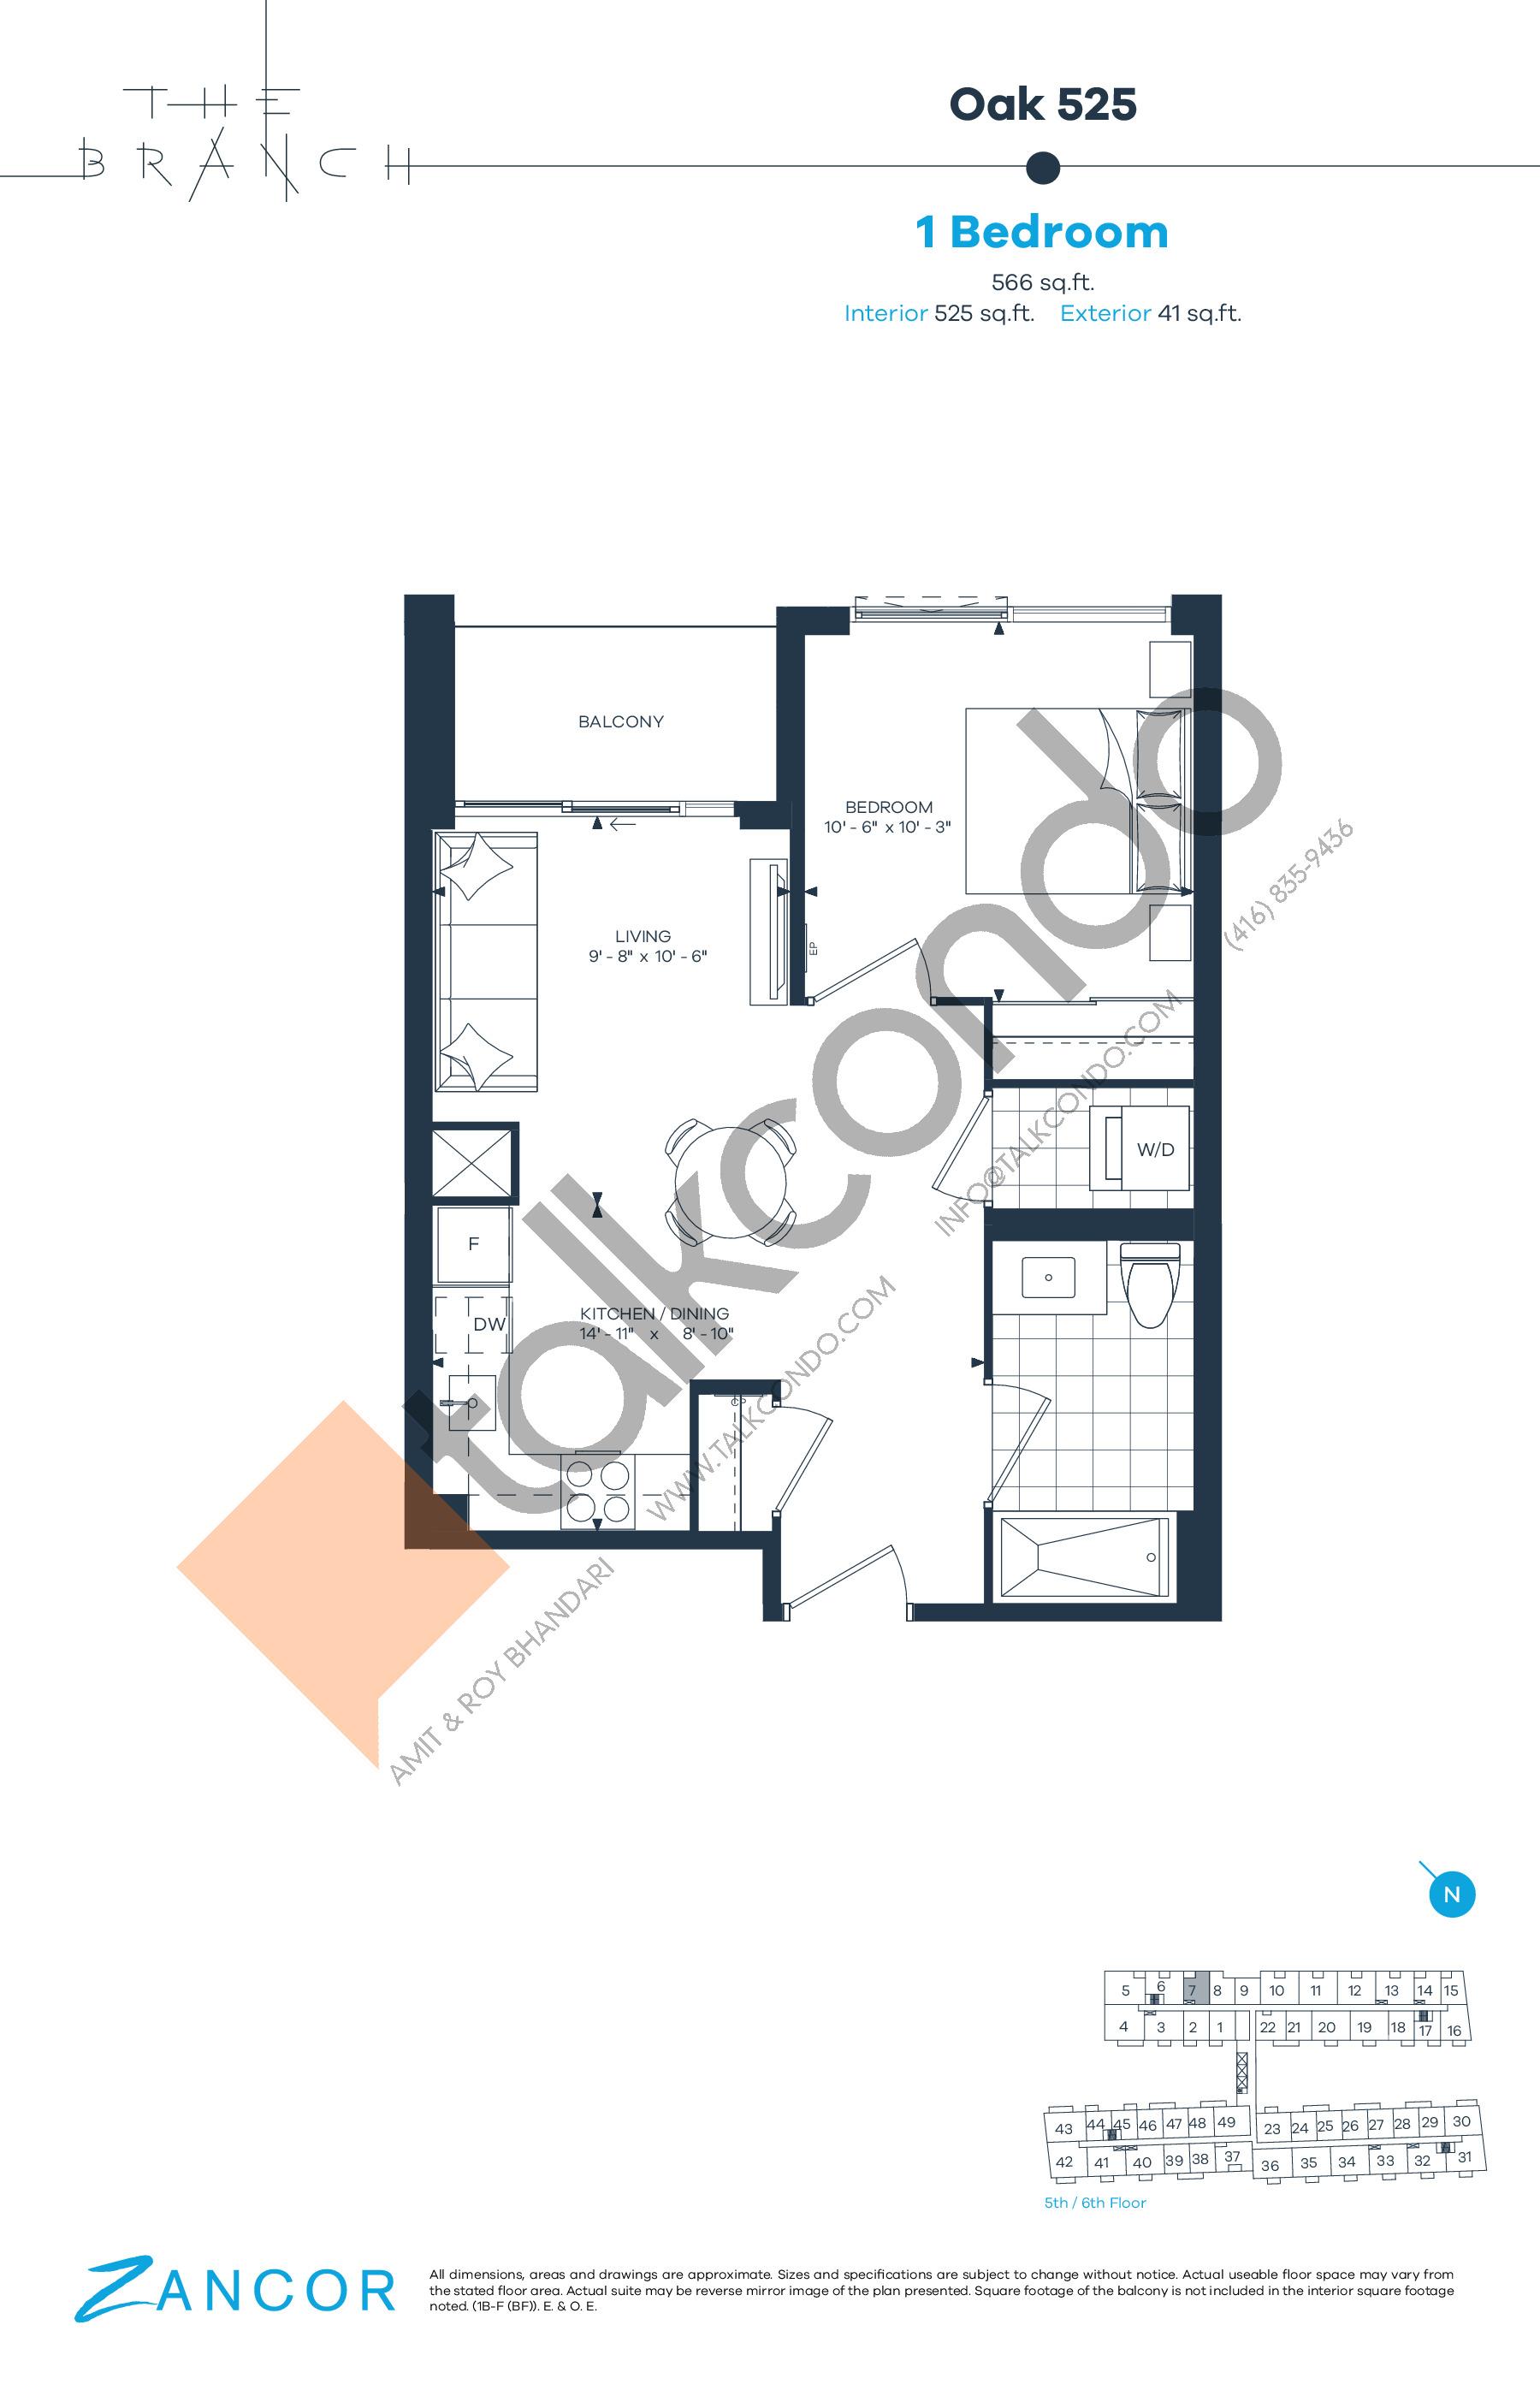 Oak 525 Floor Plan at The Branch Condos - 525 sq.ft